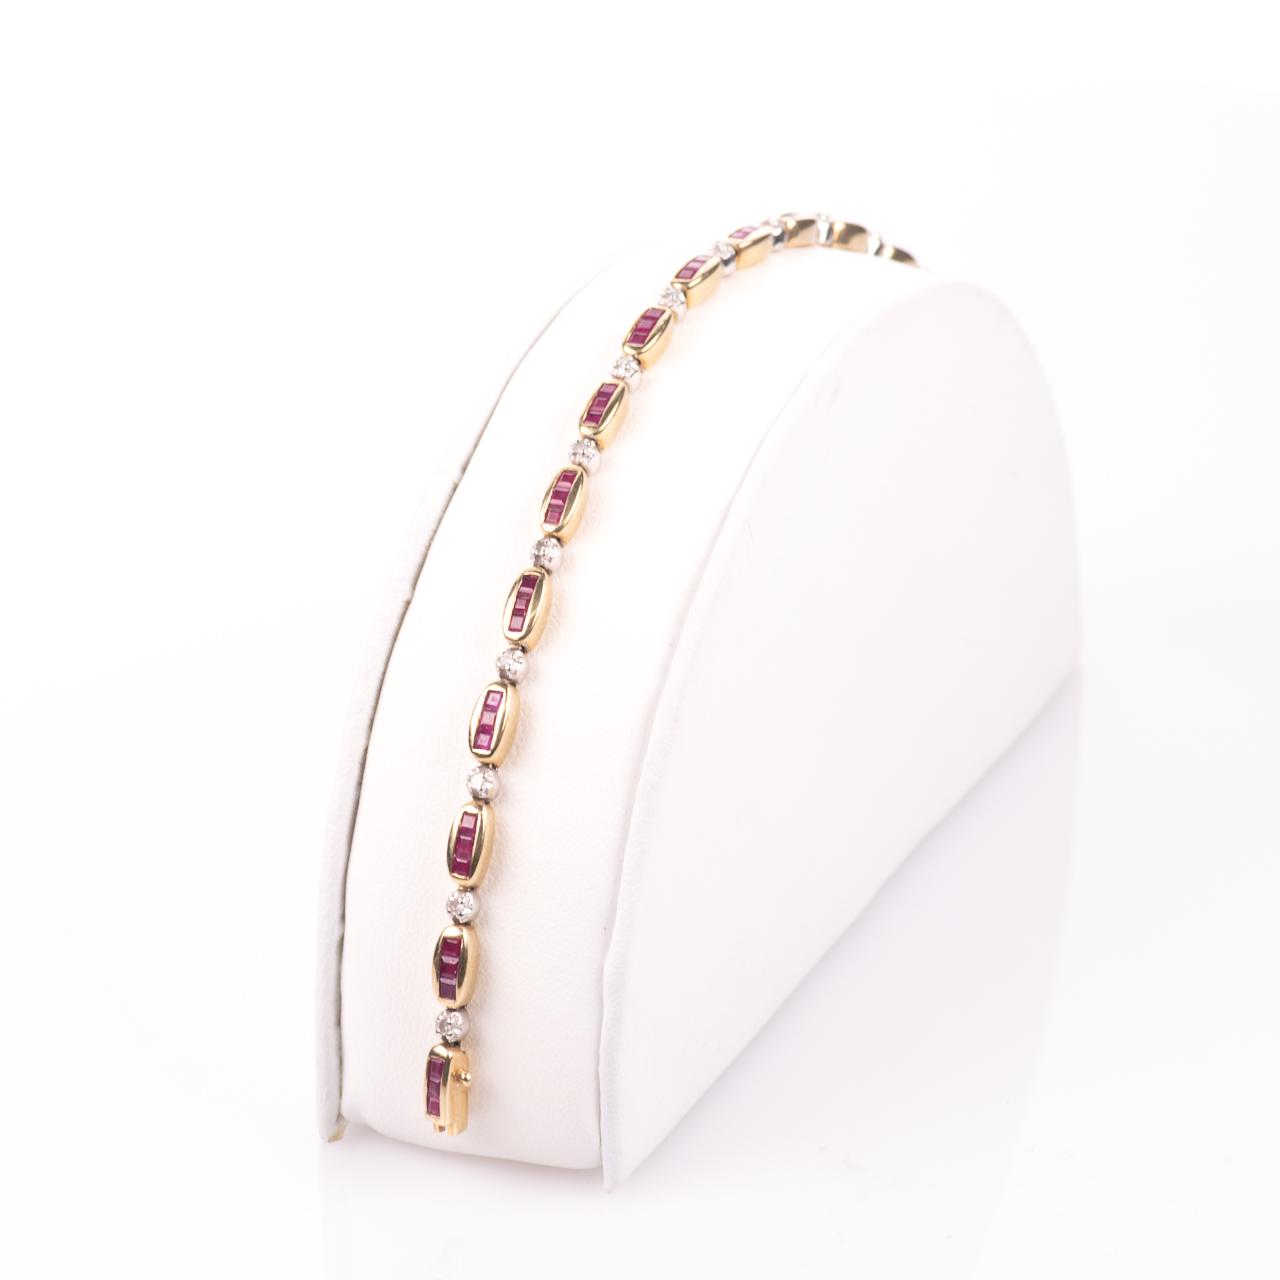 9ct Gold 2ct Ruby & Diamond Tennis Bracelet - Image 4 of 6